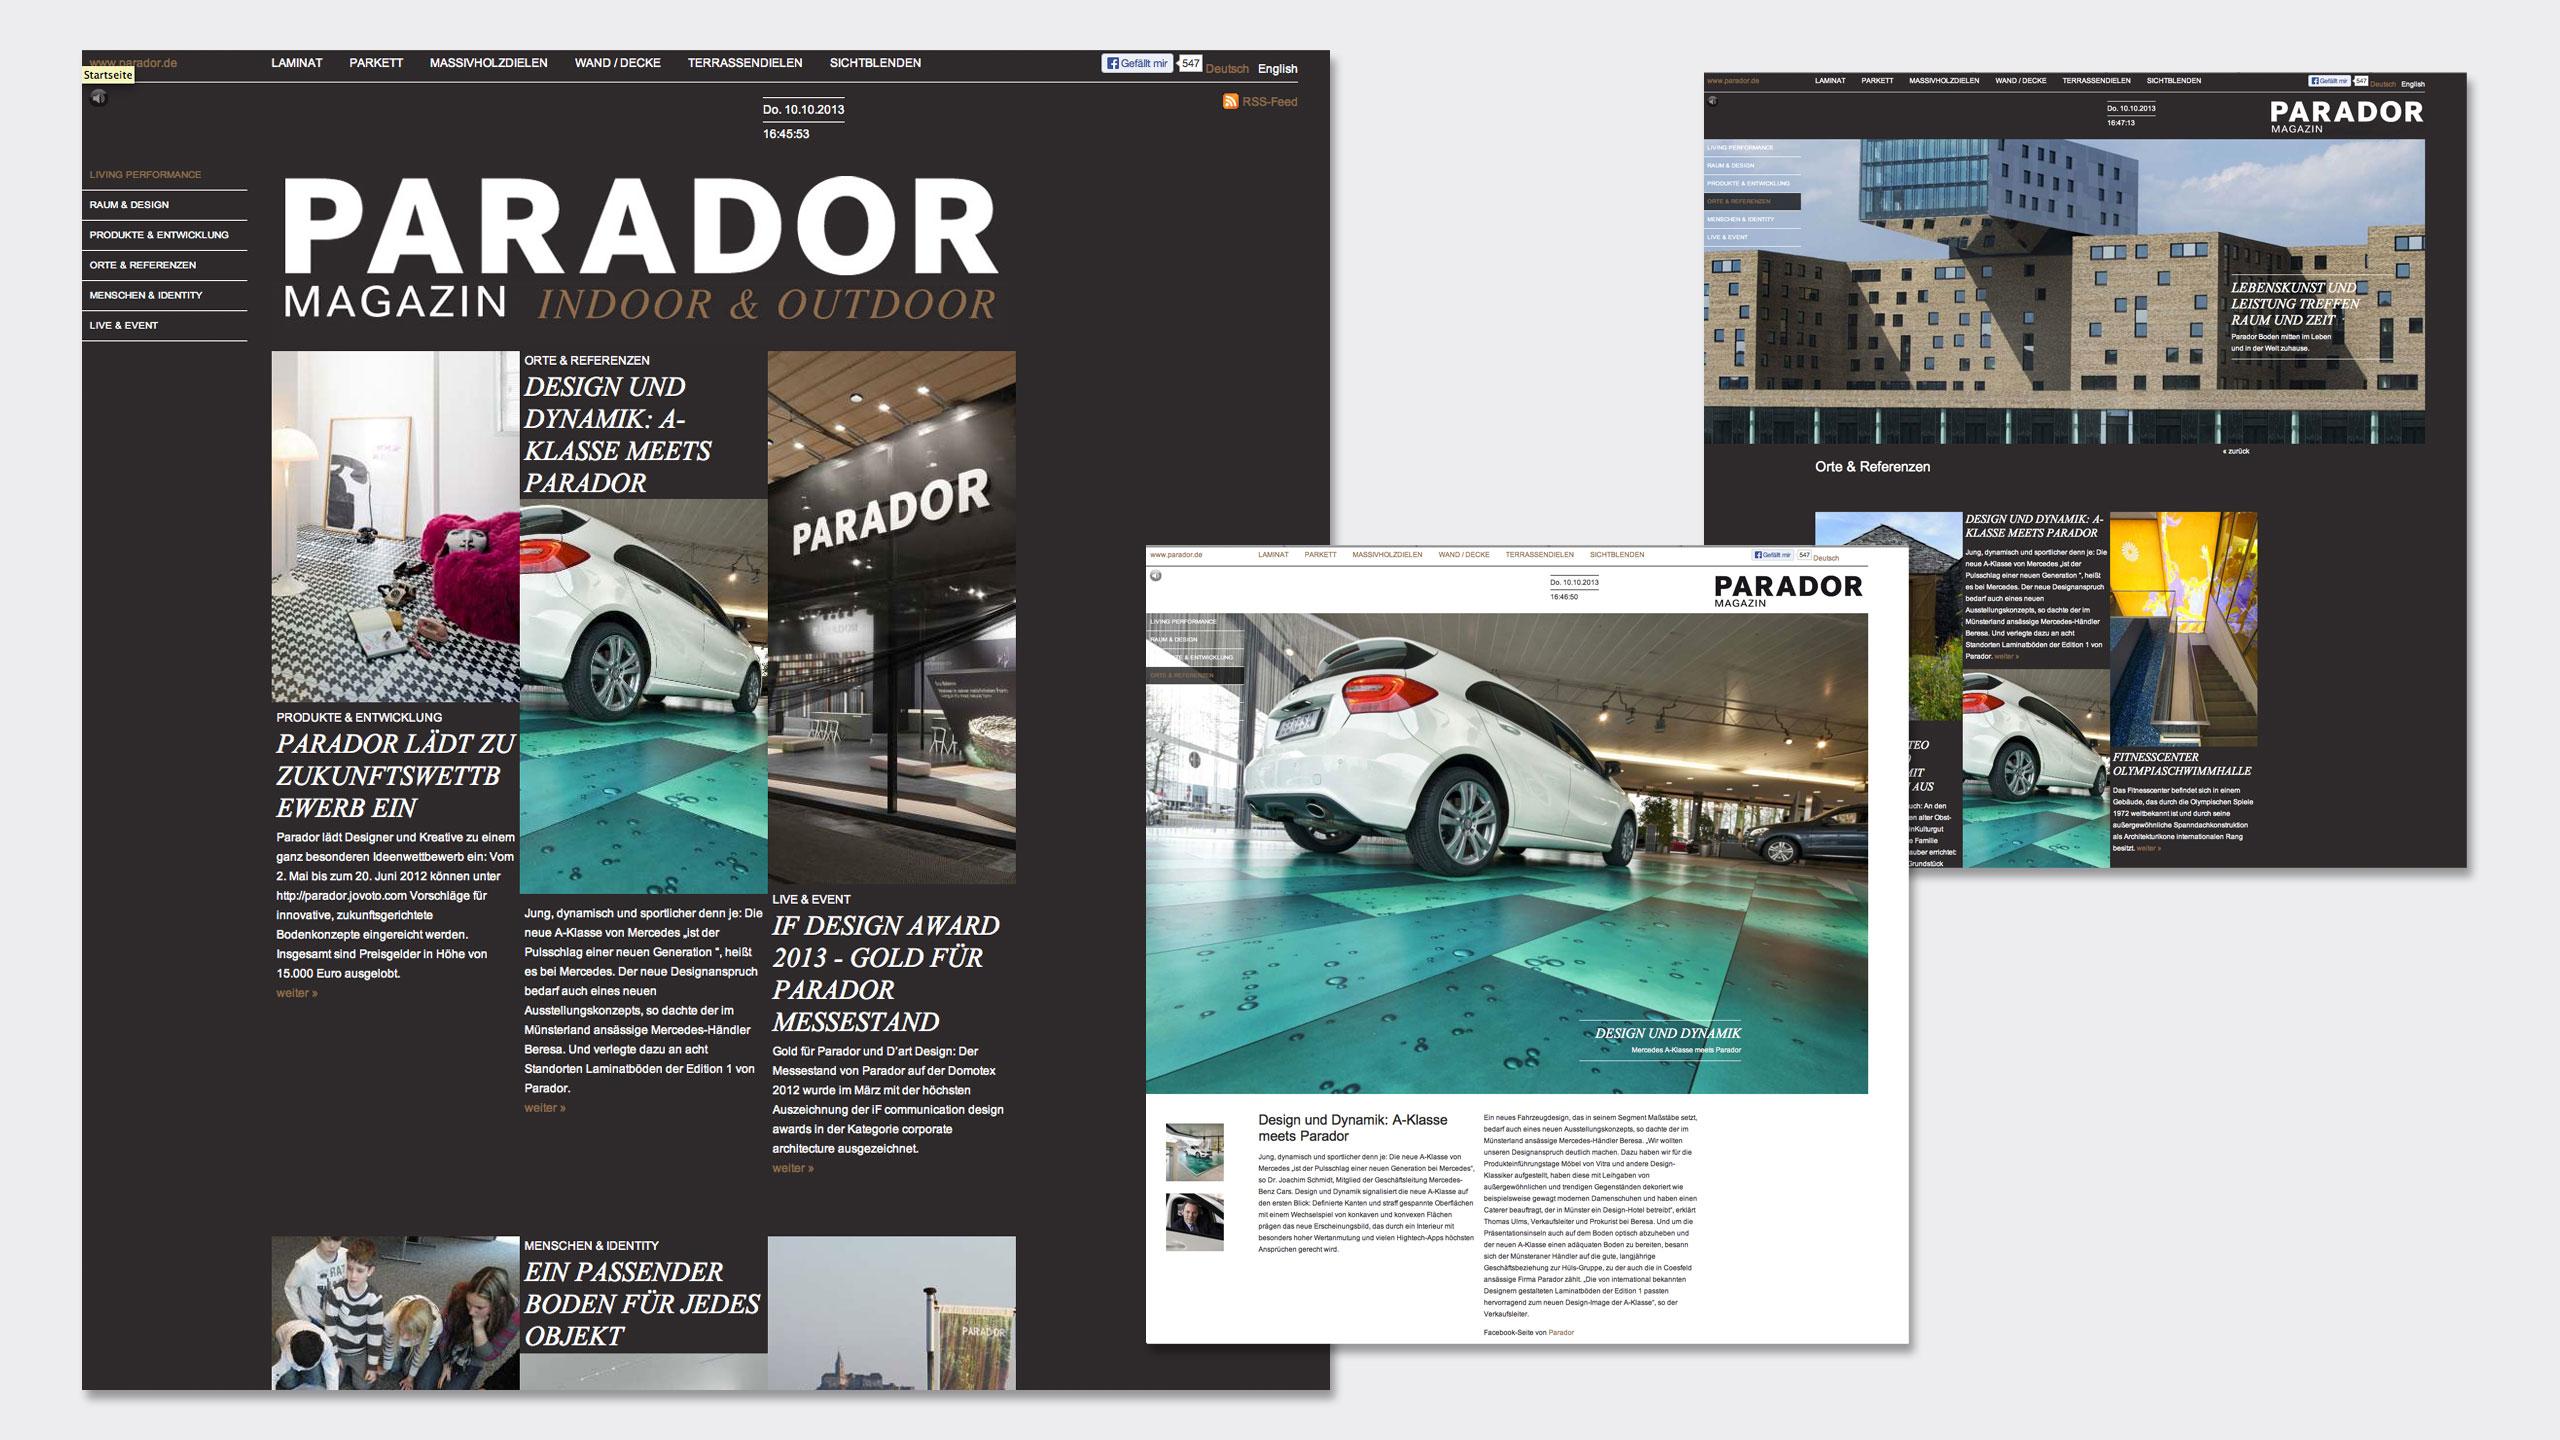 parador living performance projekt14 werbeagentur. Black Bedroom Furniture Sets. Home Design Ideas